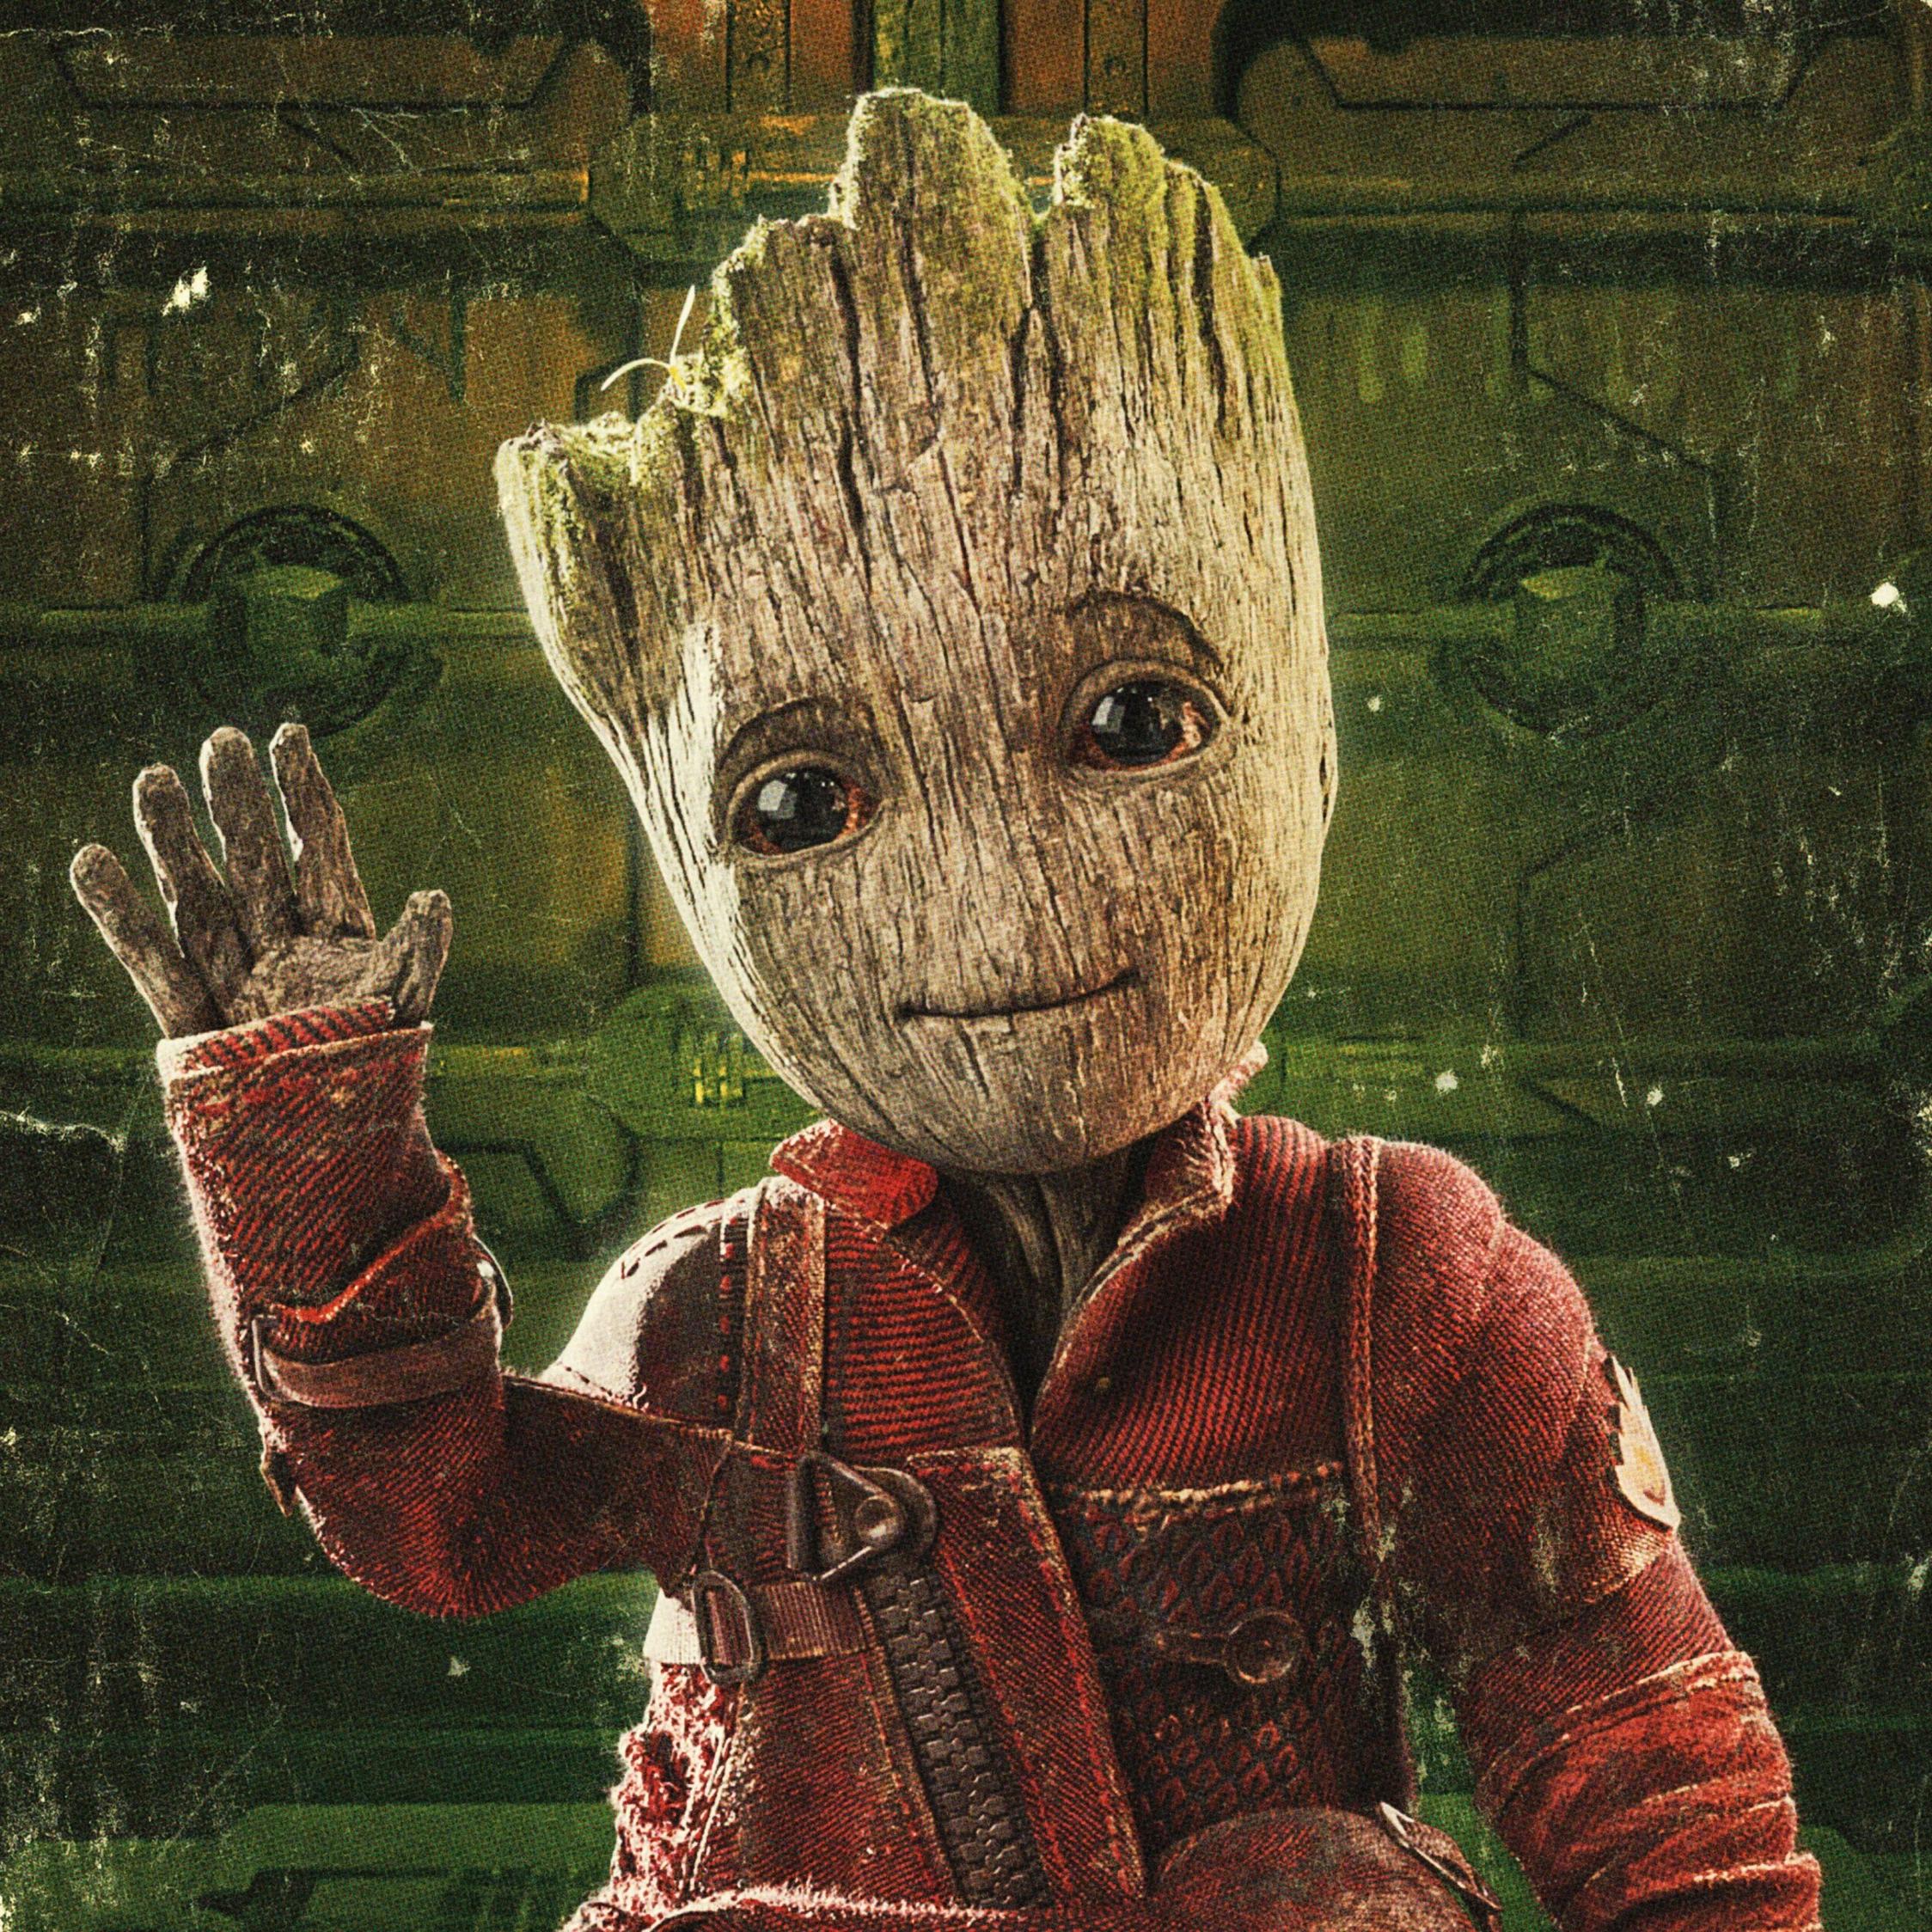 Download 2248x2248 Wallpaper Baby Groot Guardians Of The